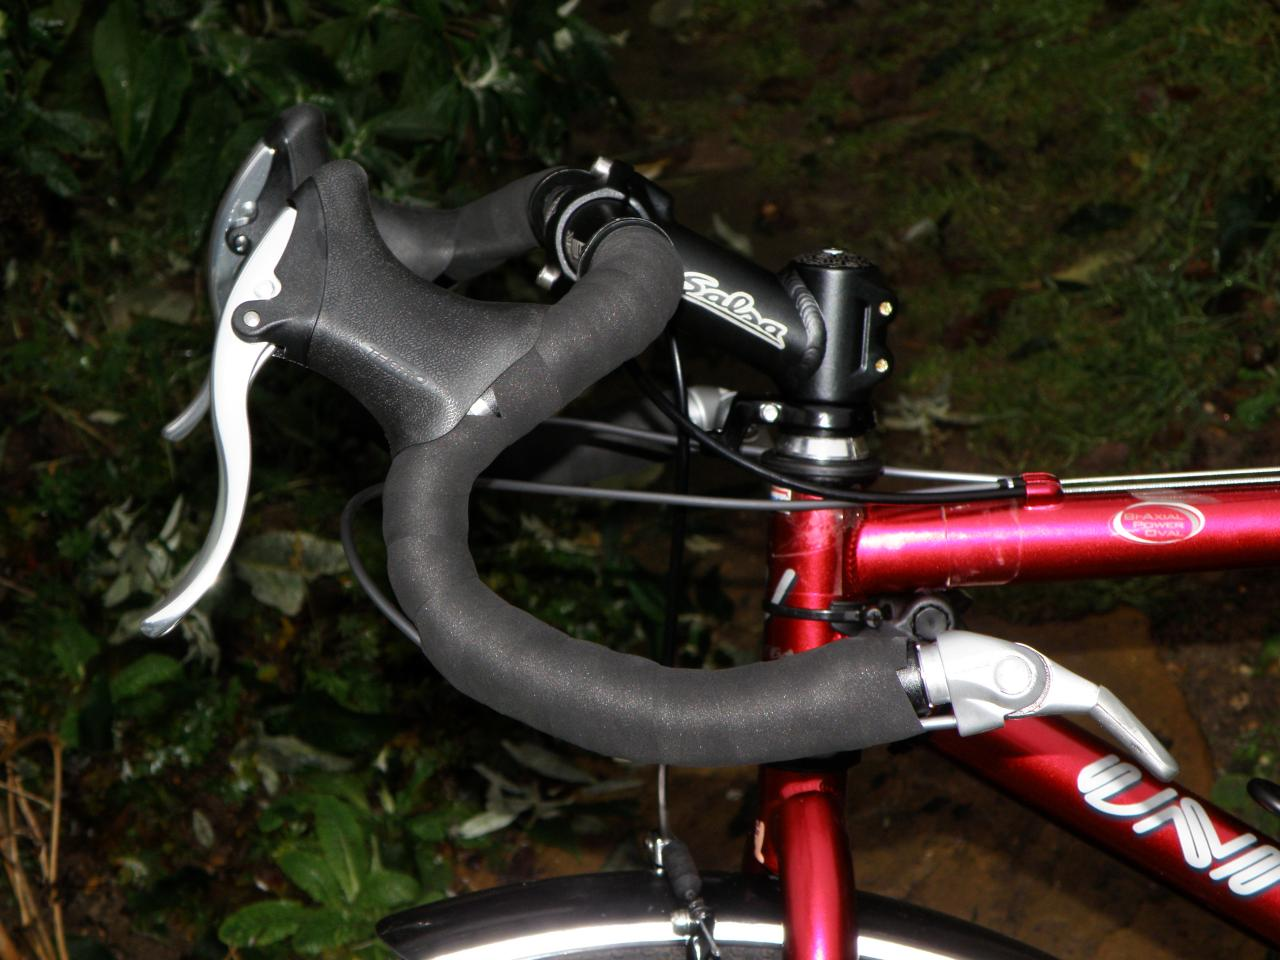 Tektro RL-520 Rennbremshebel Bremshebel Set für V-Brakes Rennlenker Cyclocross